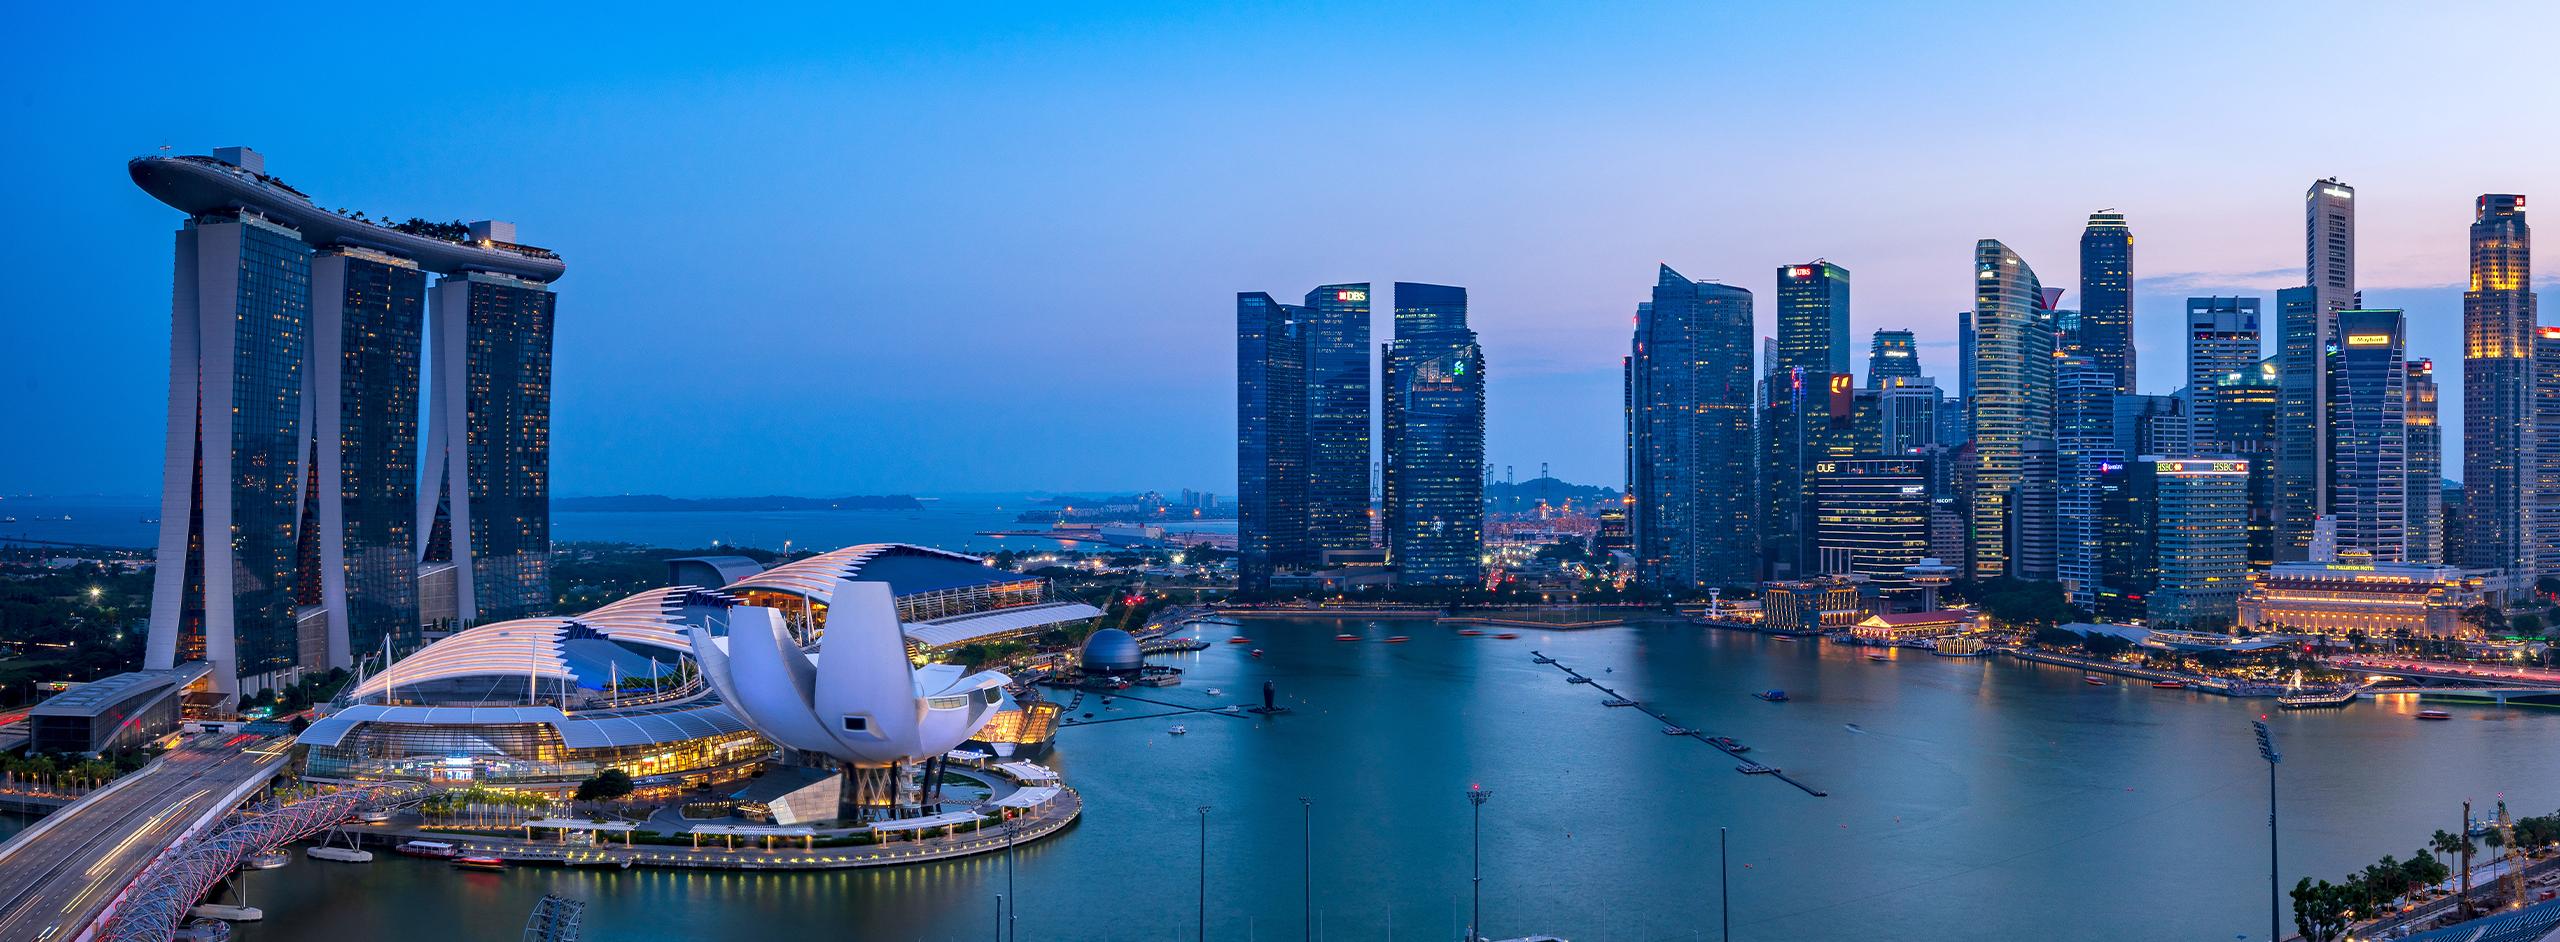 Marina Bay Sands Landscape - About IDEM